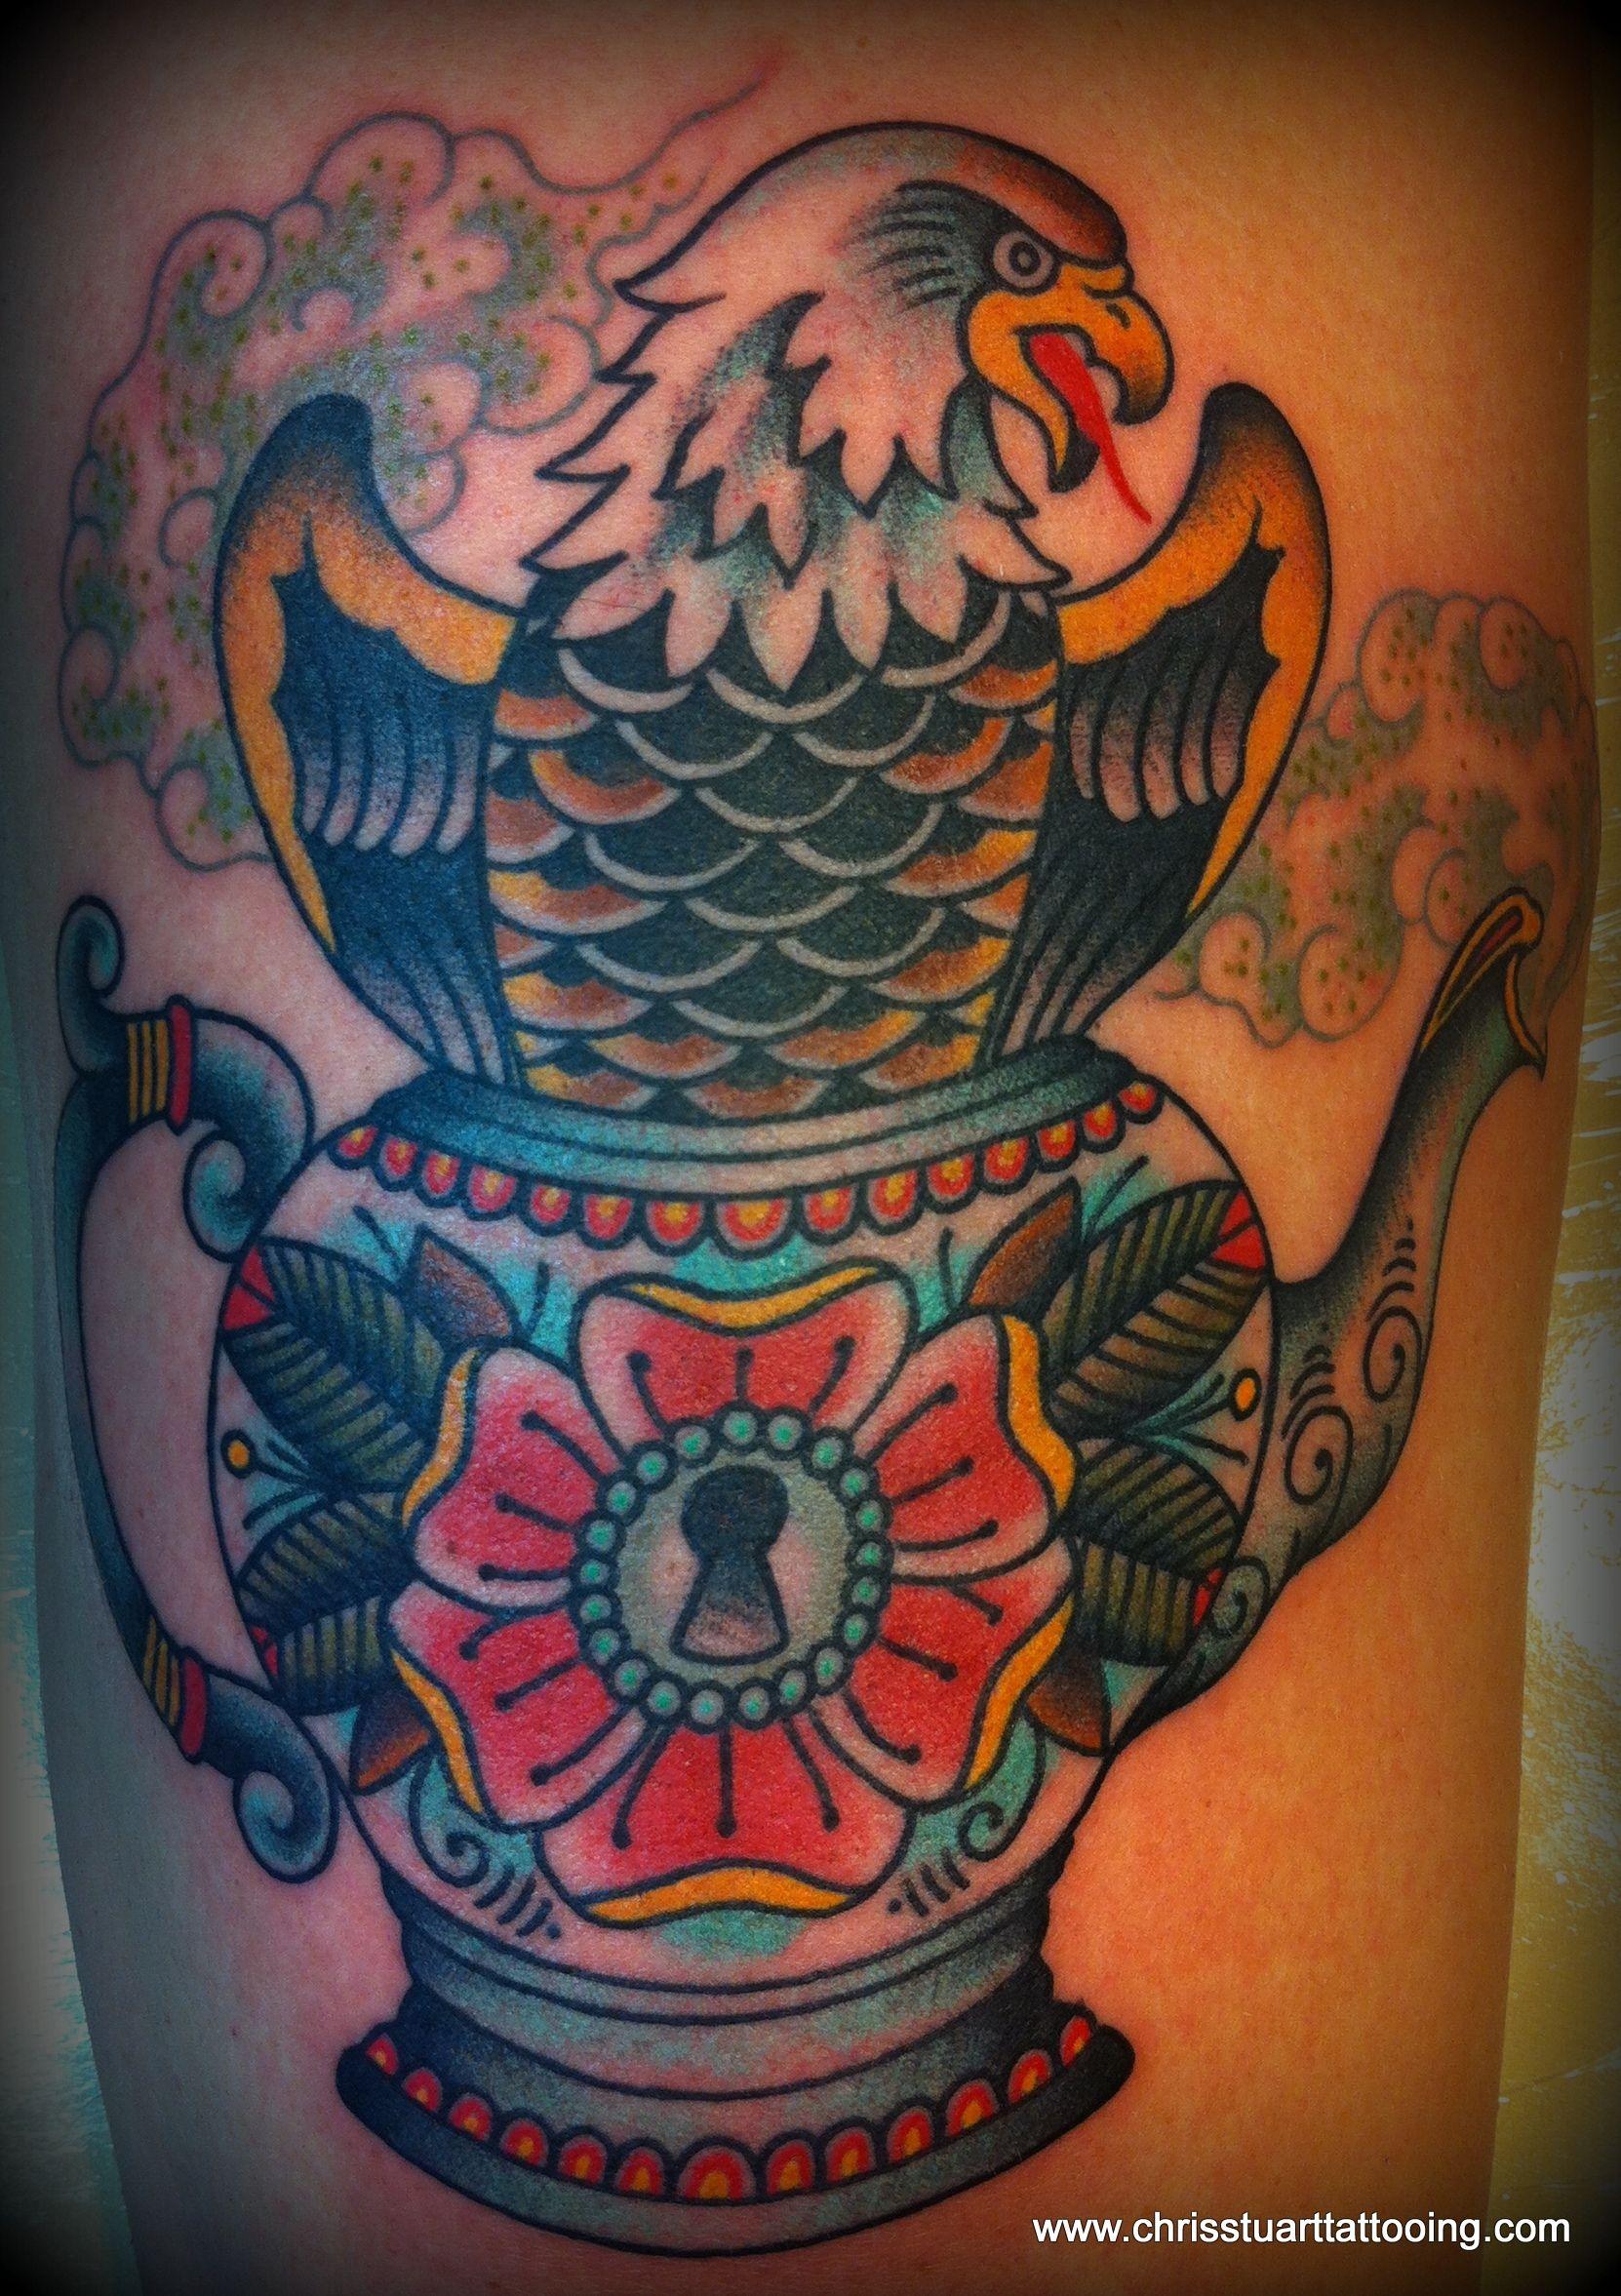 Eagle Ornate Teapot Flower Keyhole Tattoo By Chris Stuart Www Chrisstuarttattooing Com Www Facebook Com Chrisstuarttatt Ace Tattoo Keyhole Tattoo Tattoos